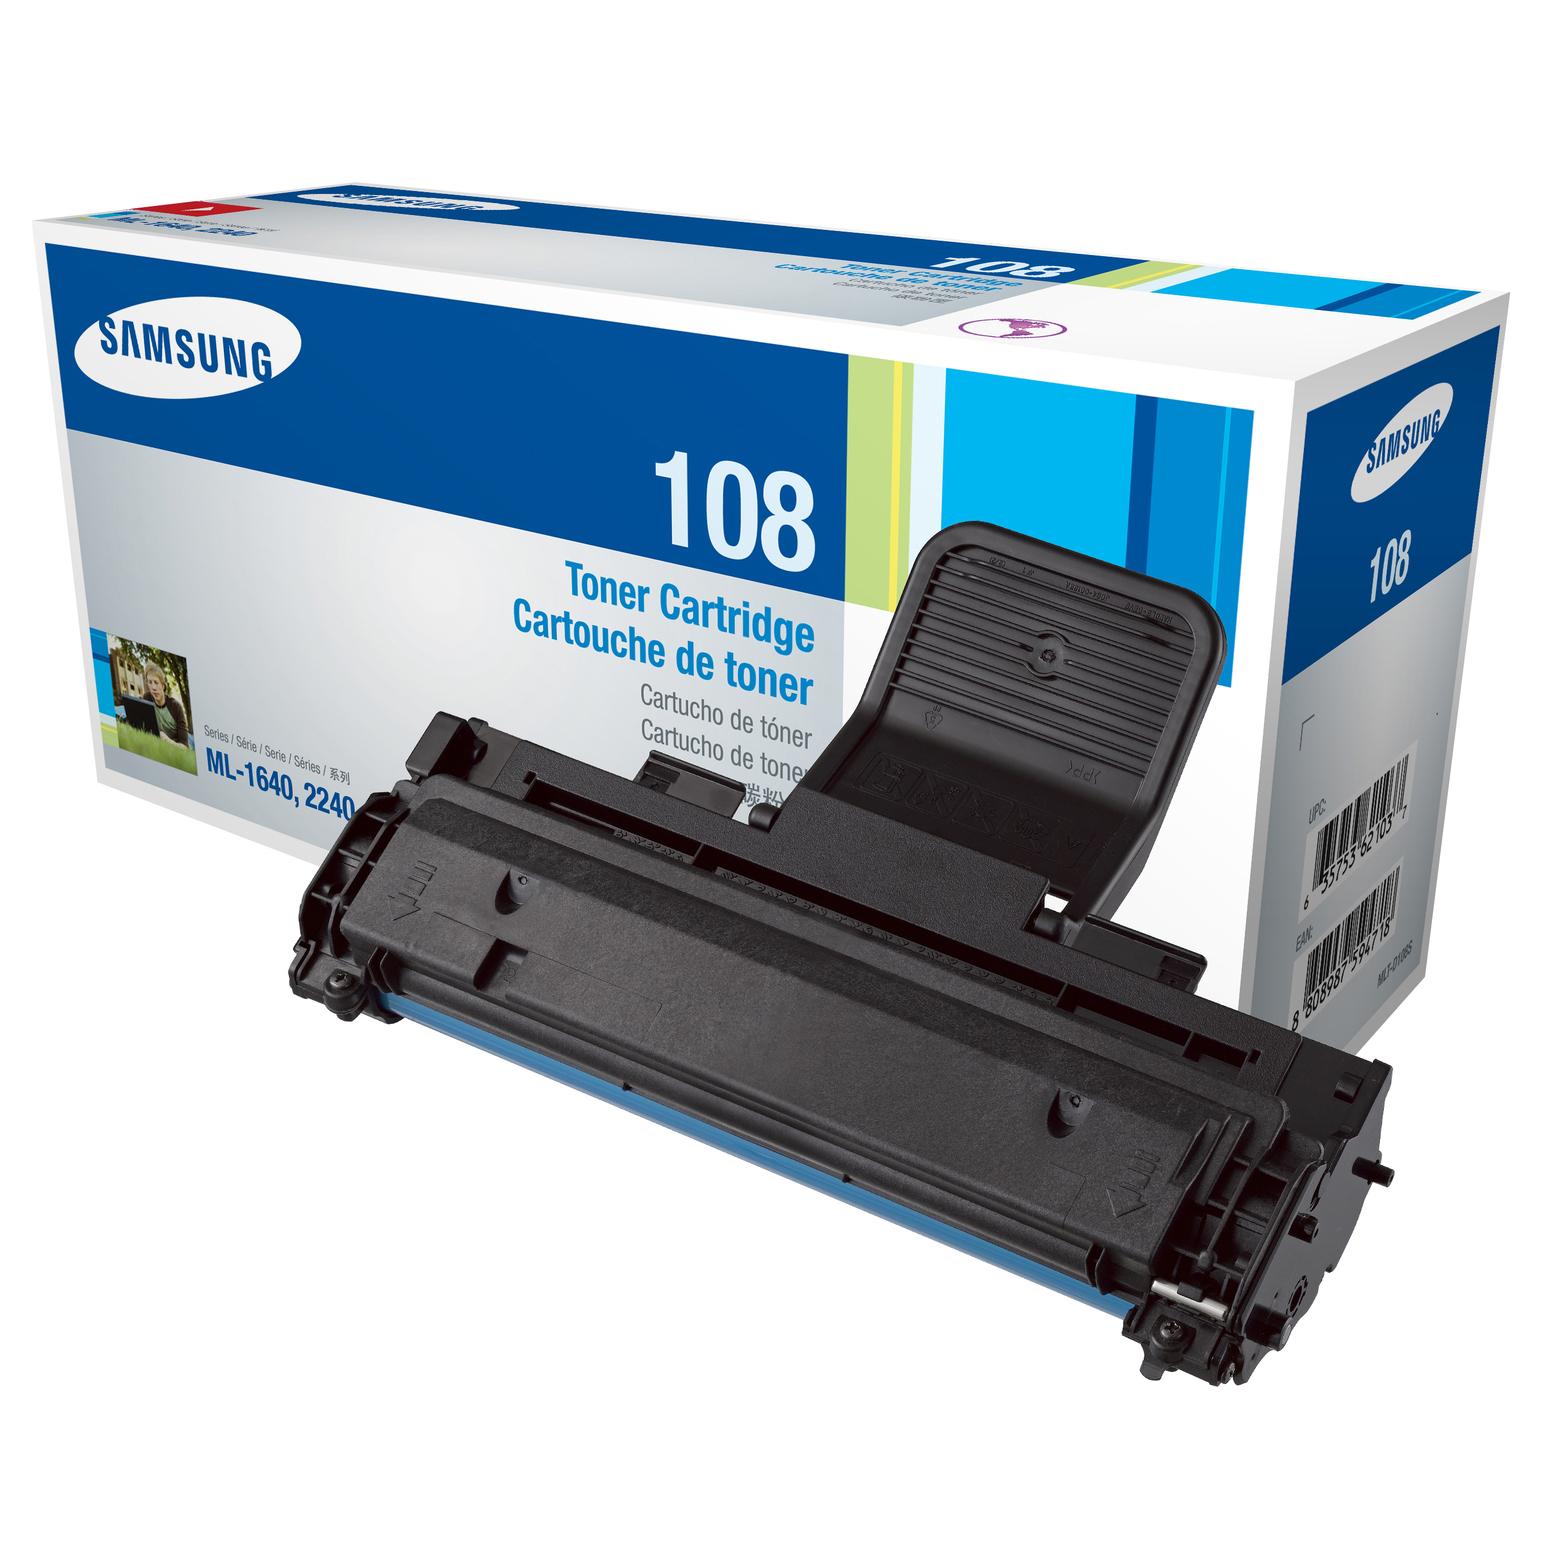 Samsung 108S Black Toner Cartridge (Original)